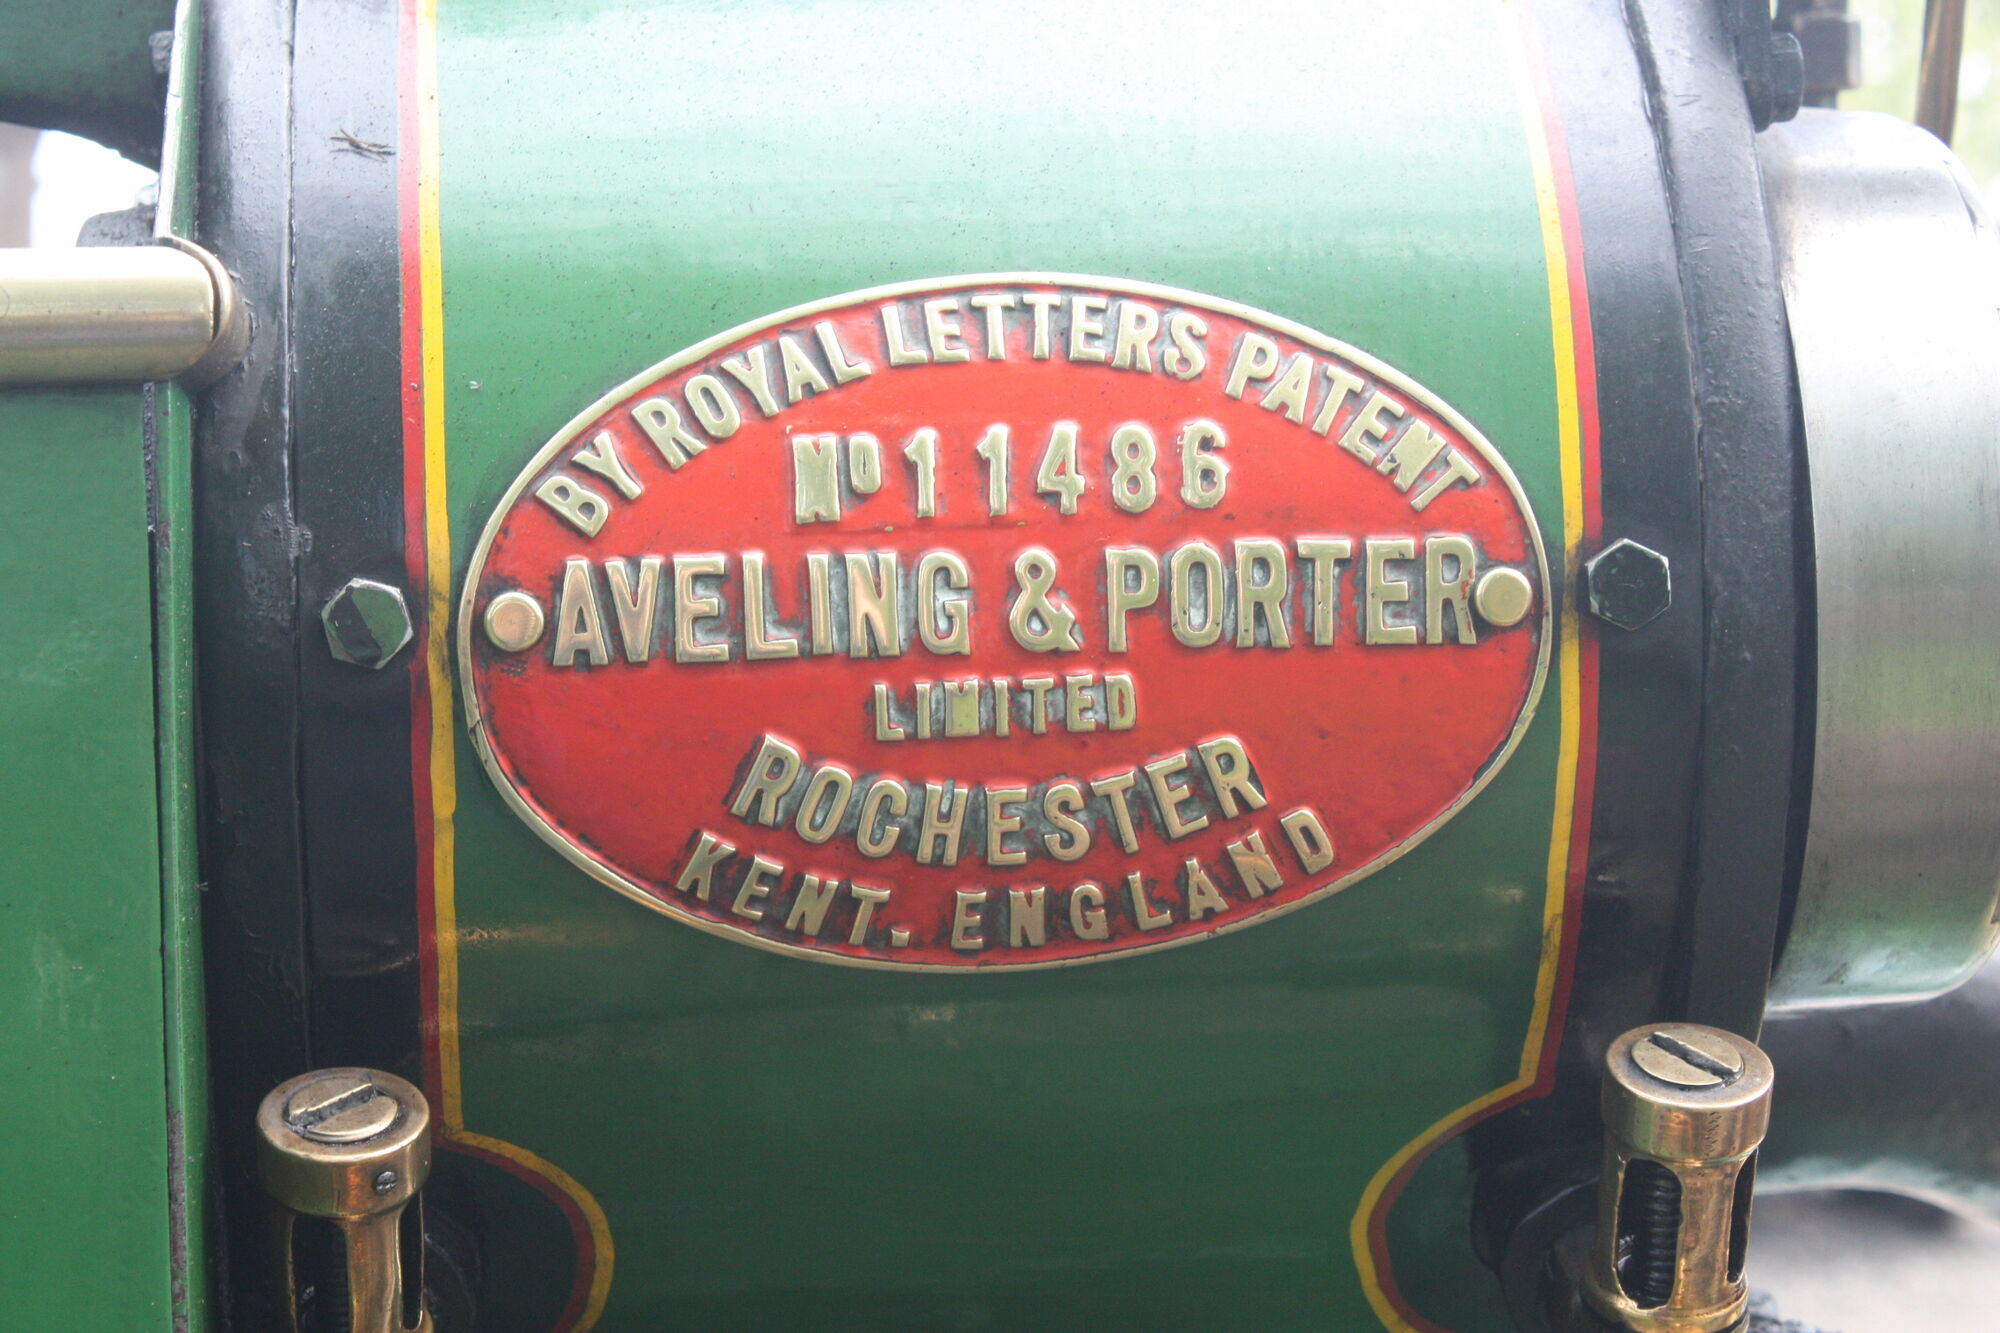 Aveling porter no 11486 tractor construction plant wiki fandom powered by wikia - Porter international wiki ...